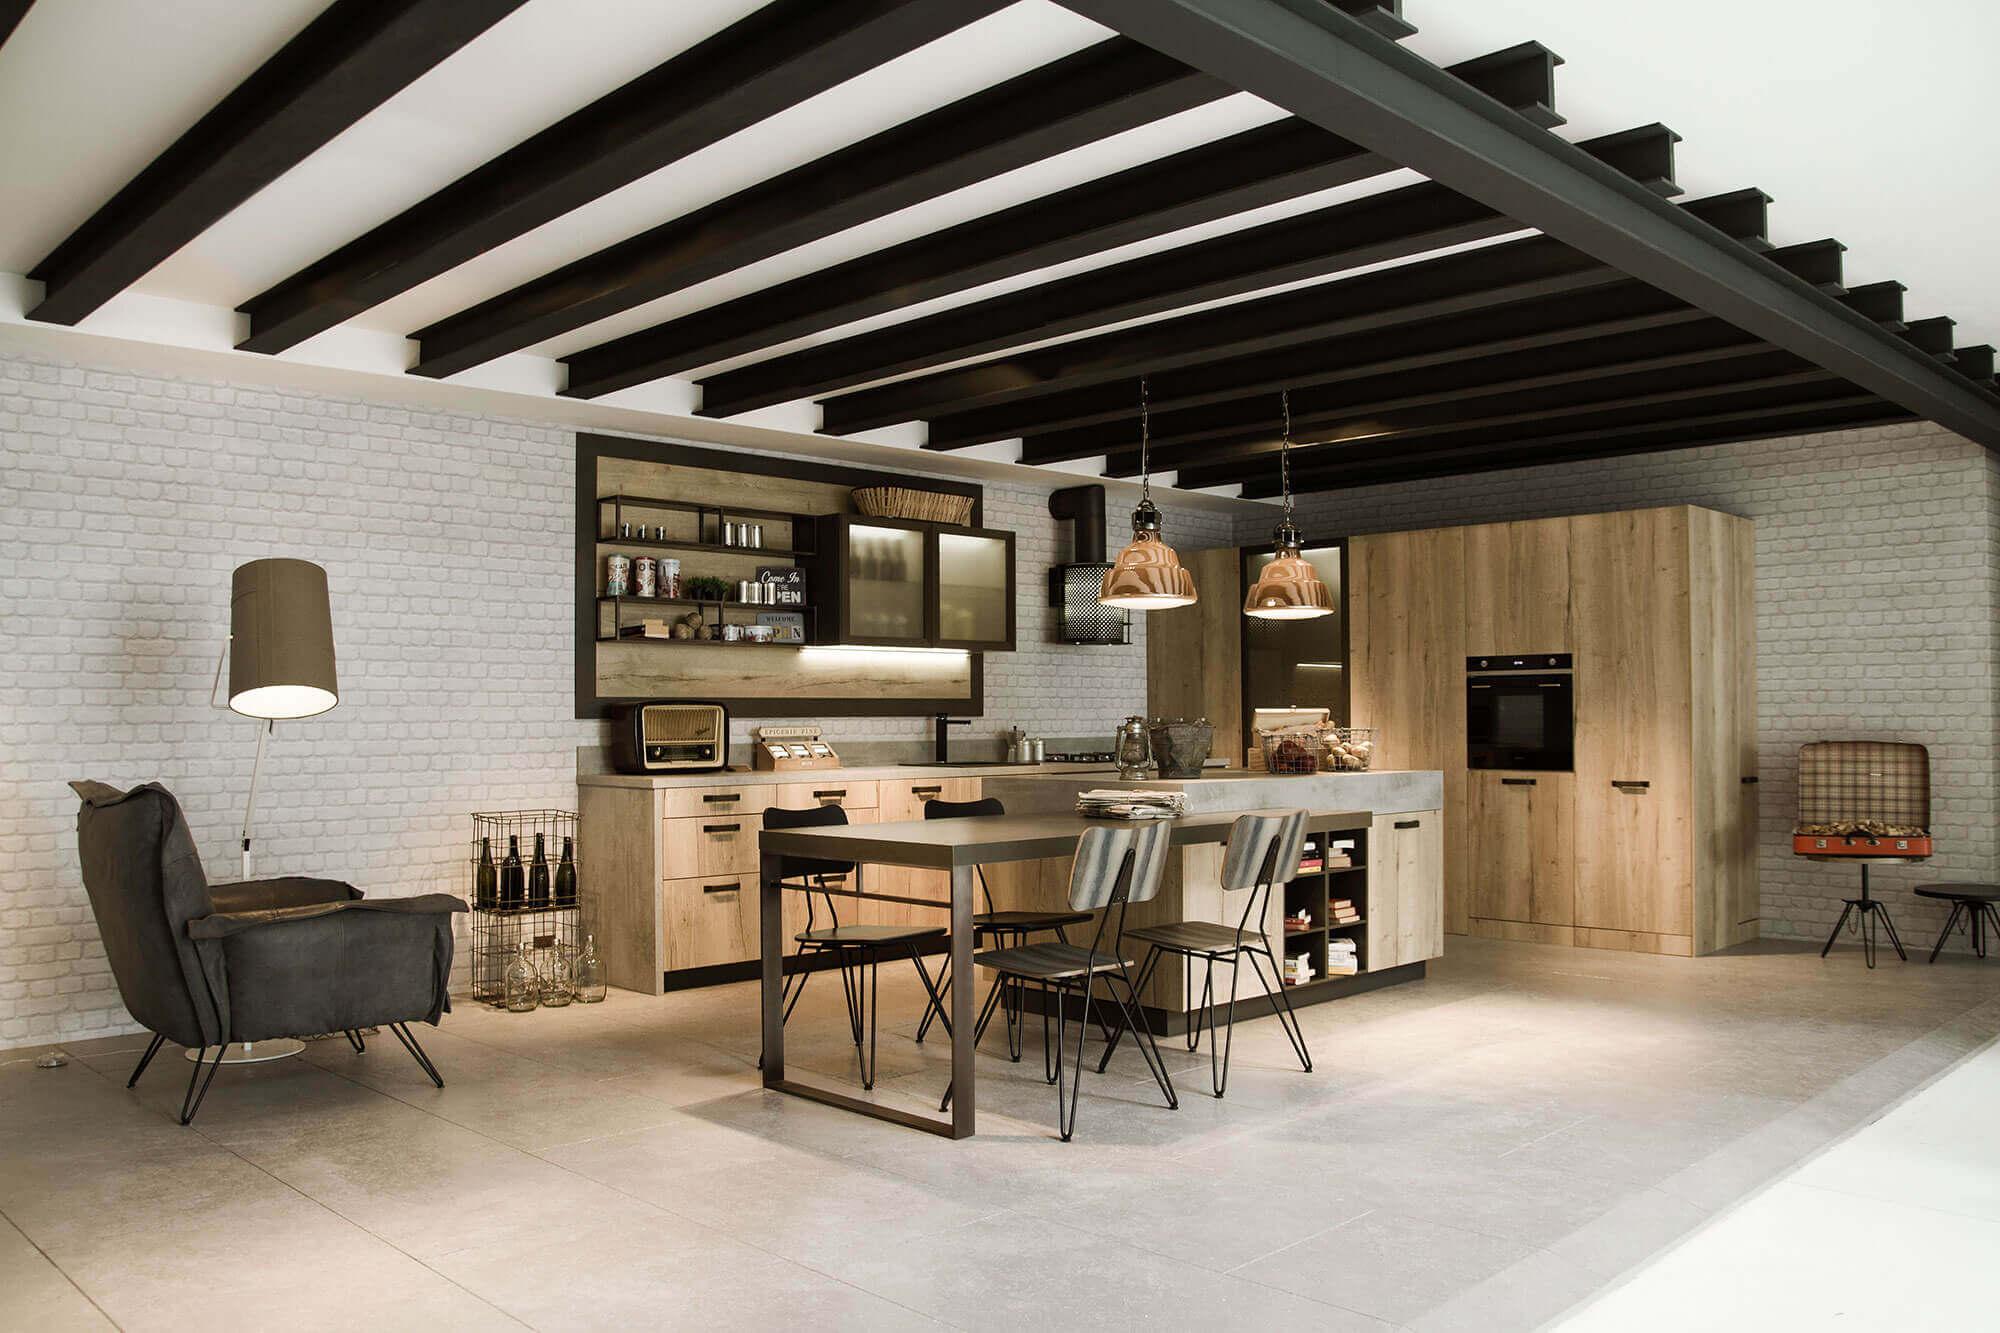 Grote houten keukens